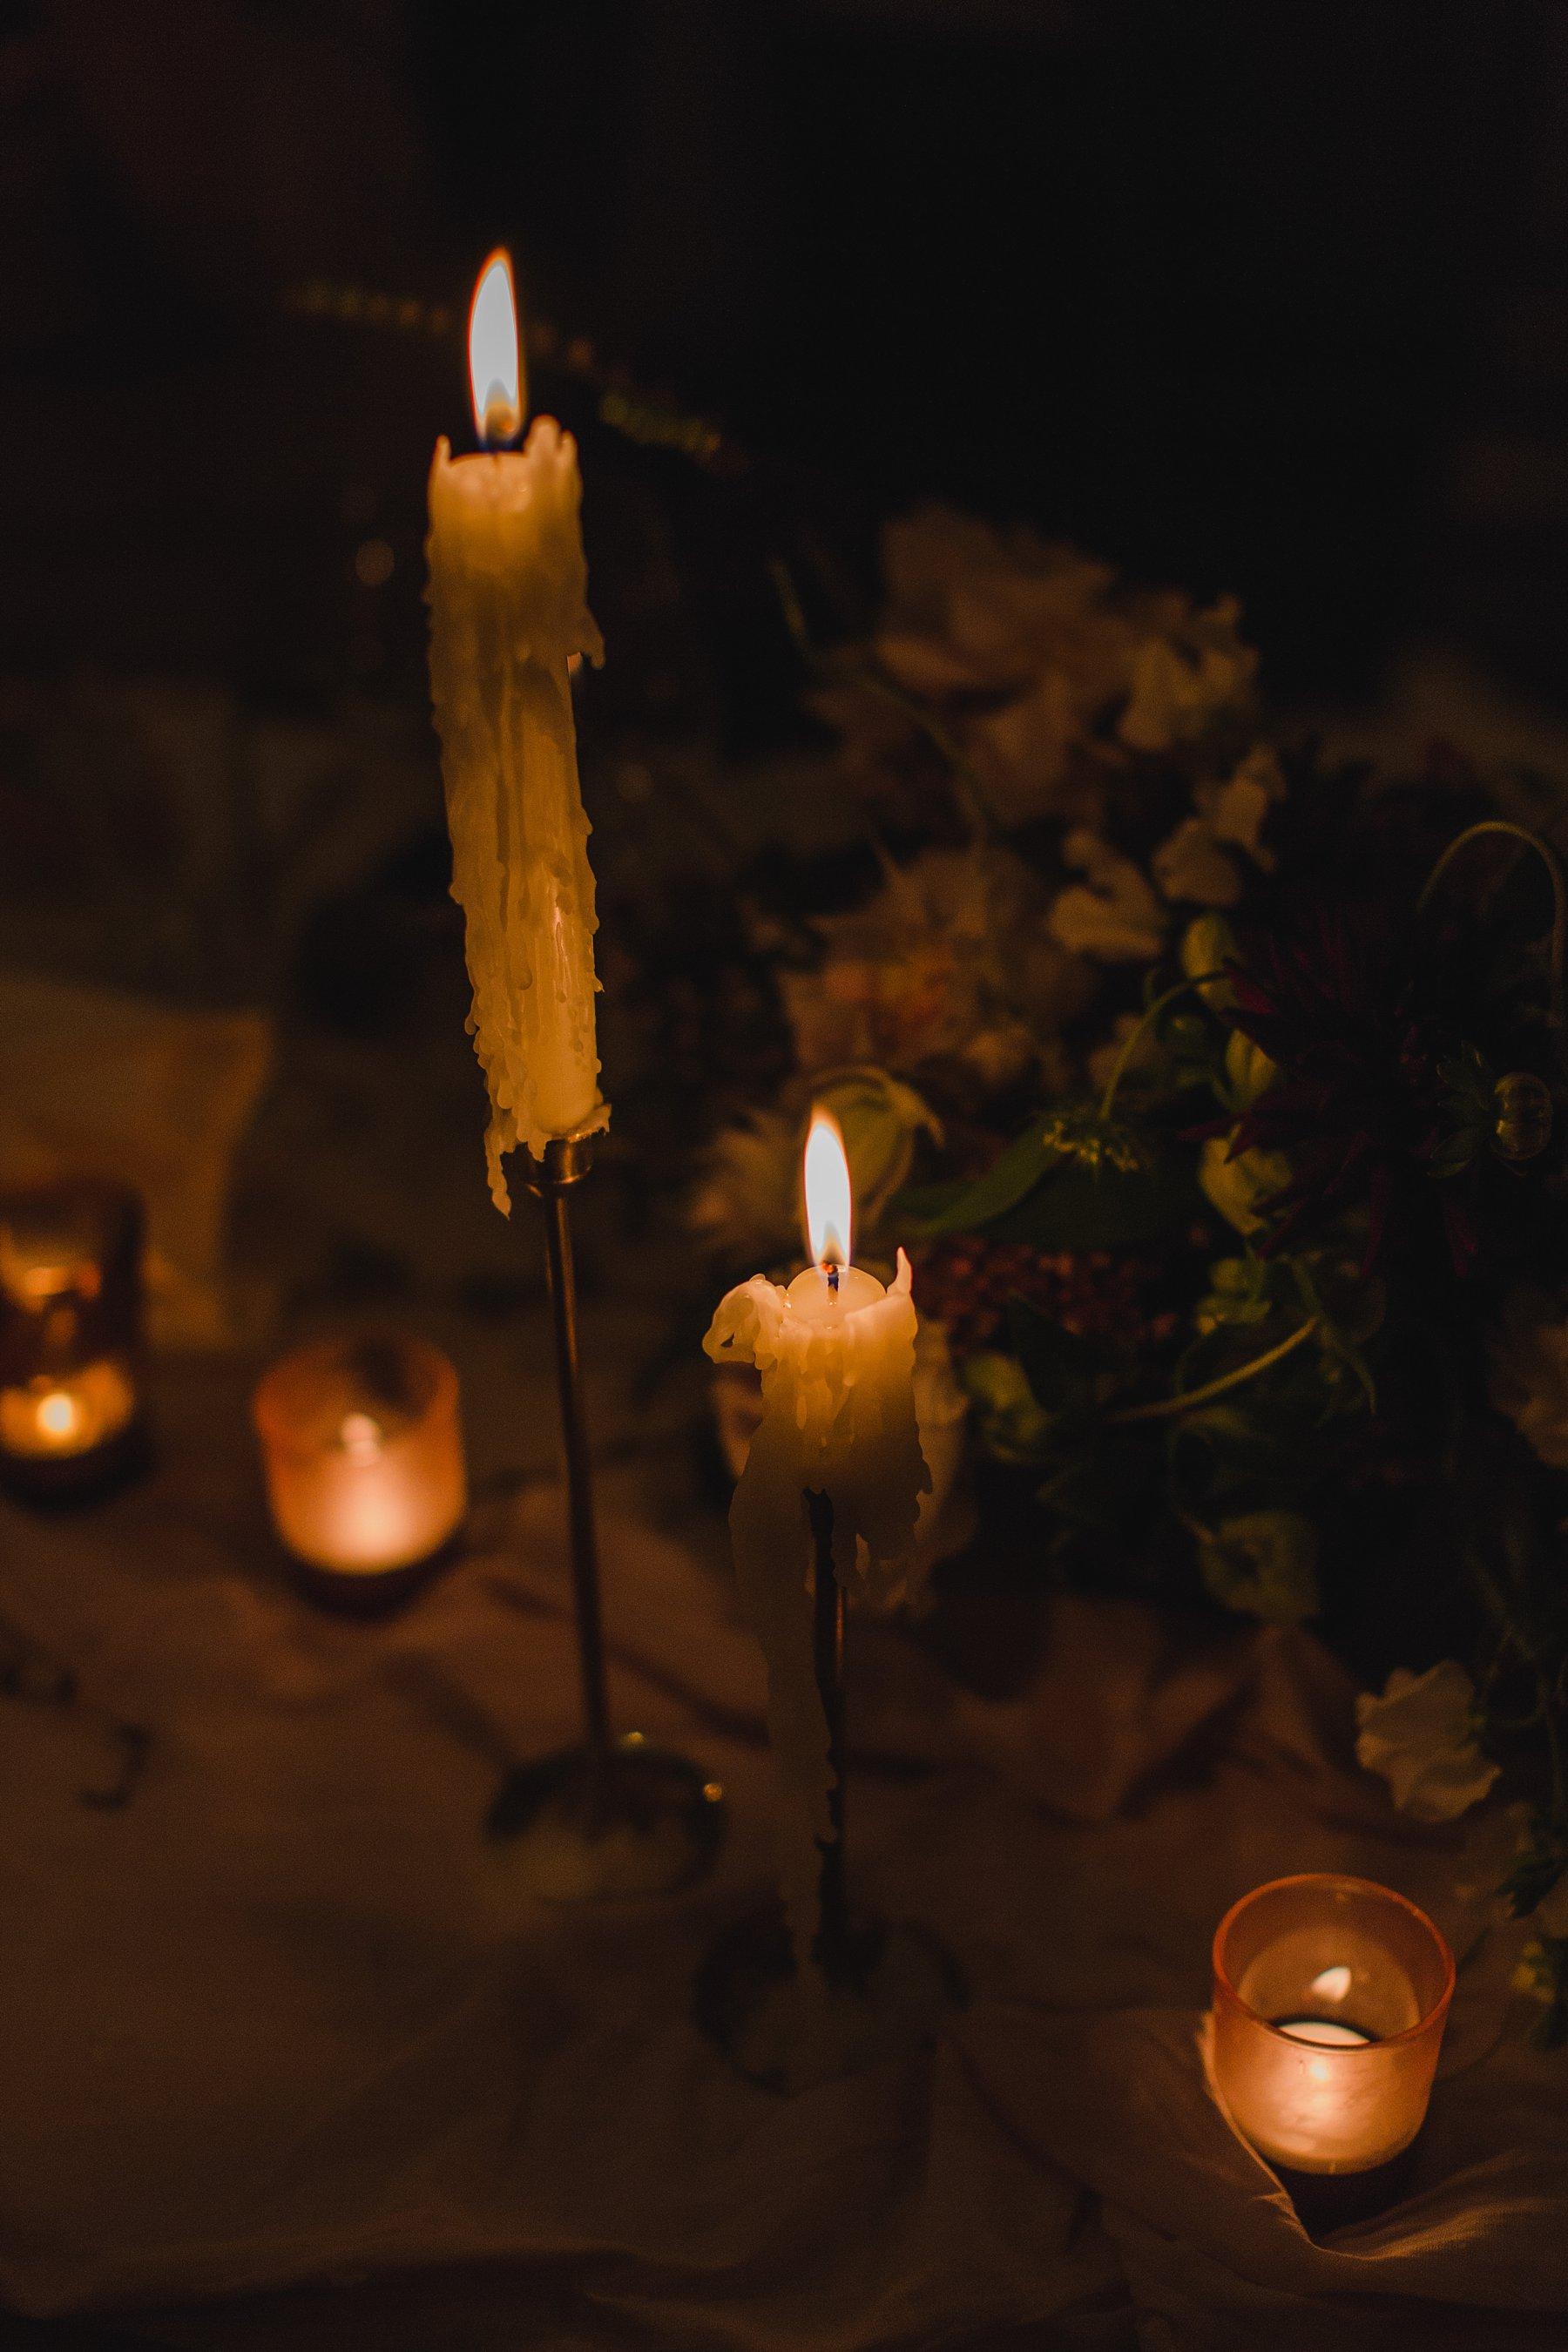 brooklodge_ireland_wicklow_weddings_0064